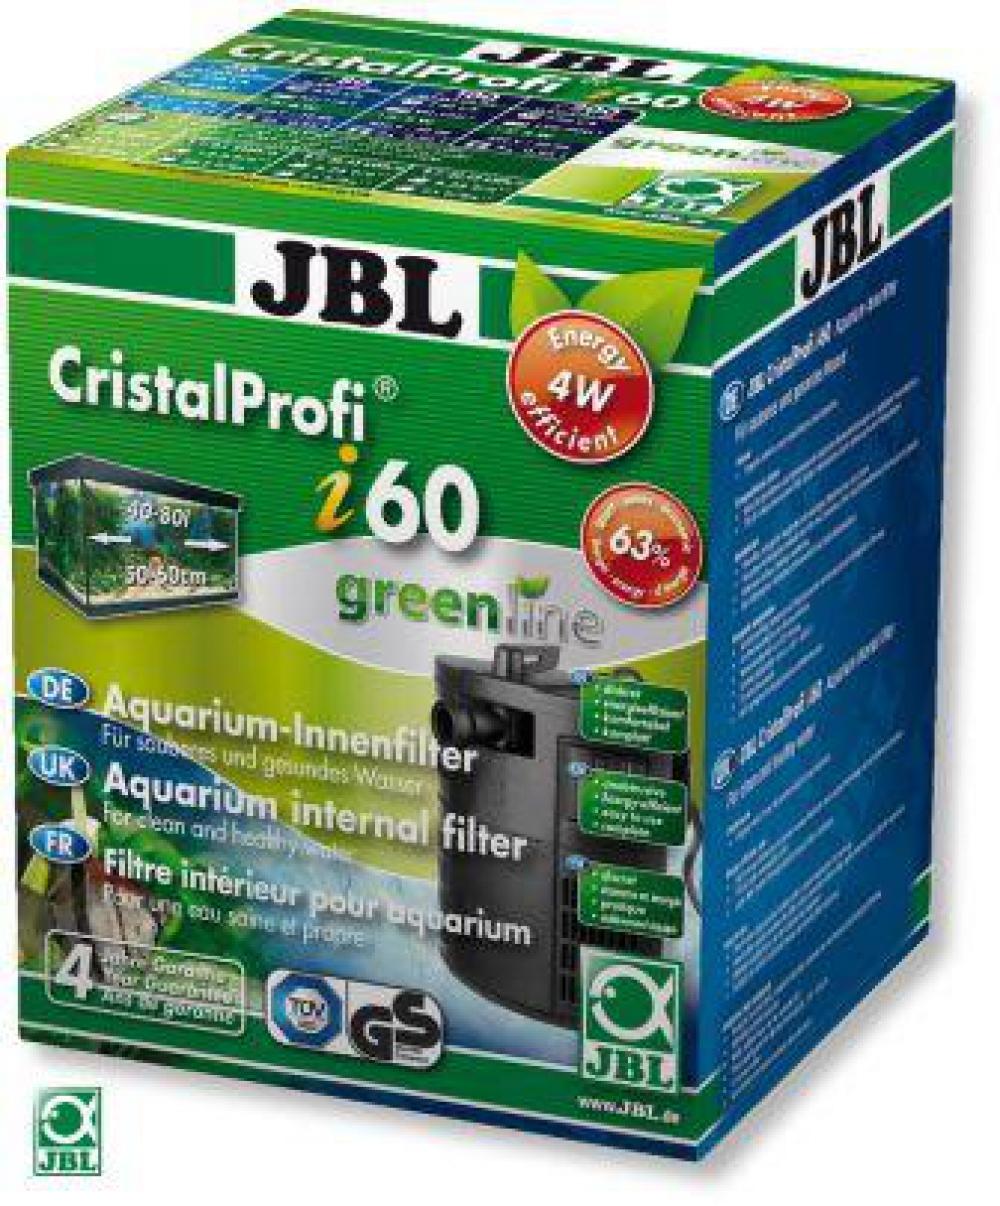 JBL CristalProfi i60 greenline. Внутренний фильтр для аквариума 40-80 литров - 2